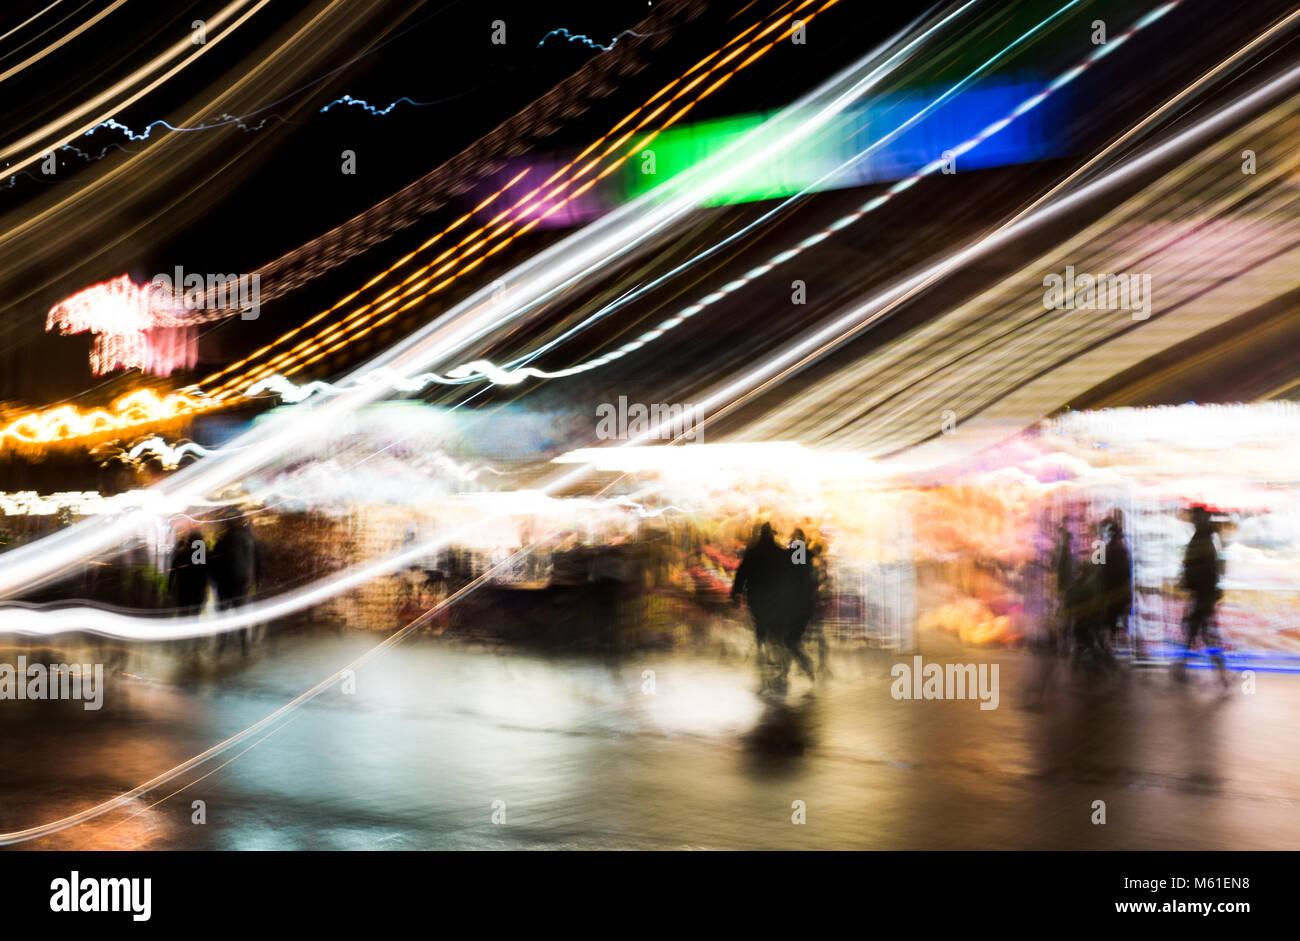 Blackpool Illuminations - Stock Image